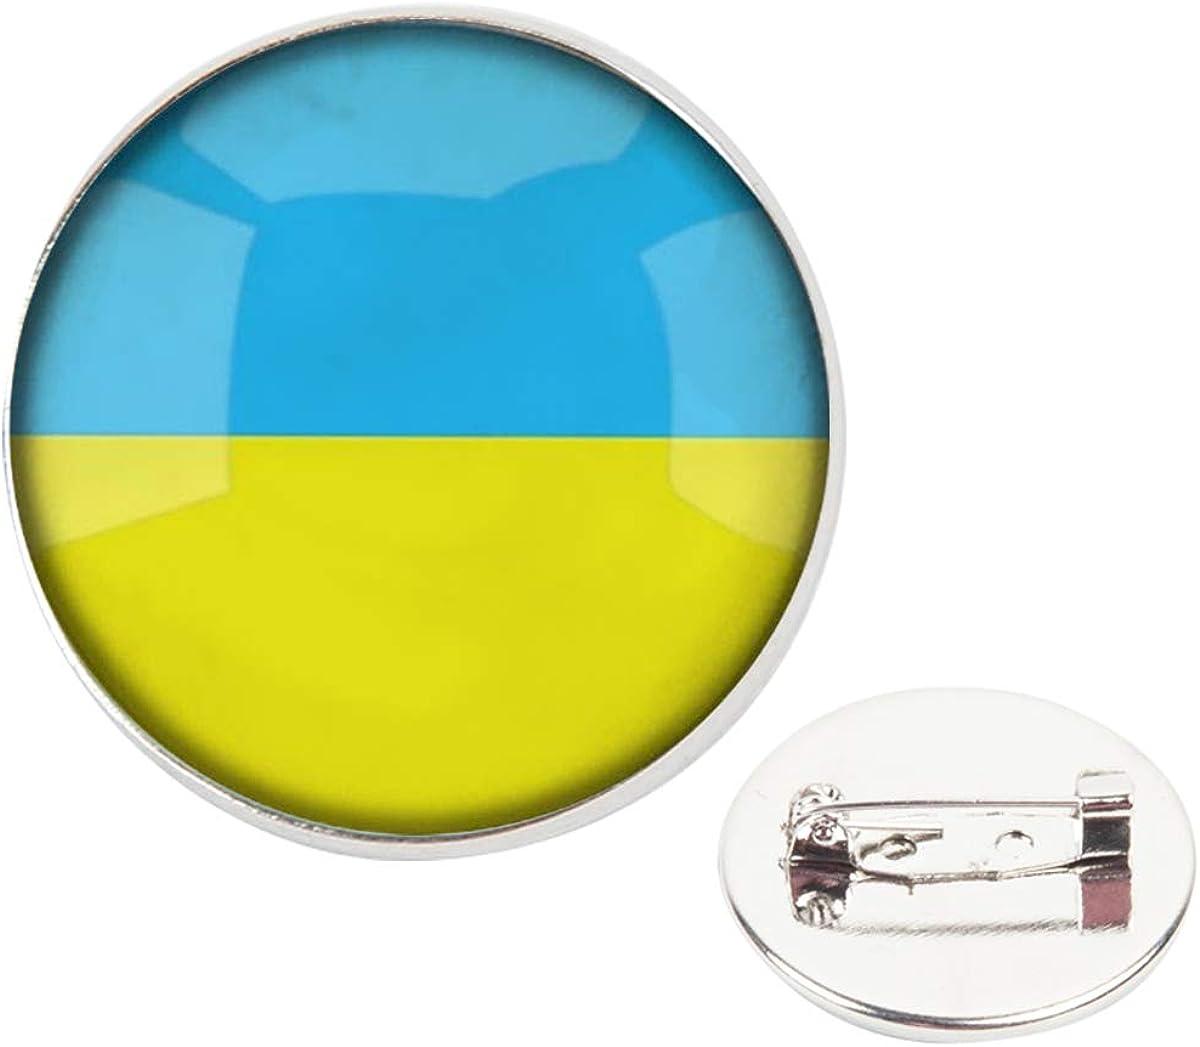 Pinback Buttons Badges Pins The Ukraine National Flag Lapel Pin Brooch Clip Trendy Accessory Jacket T-Shirt Bag Hat Shoe